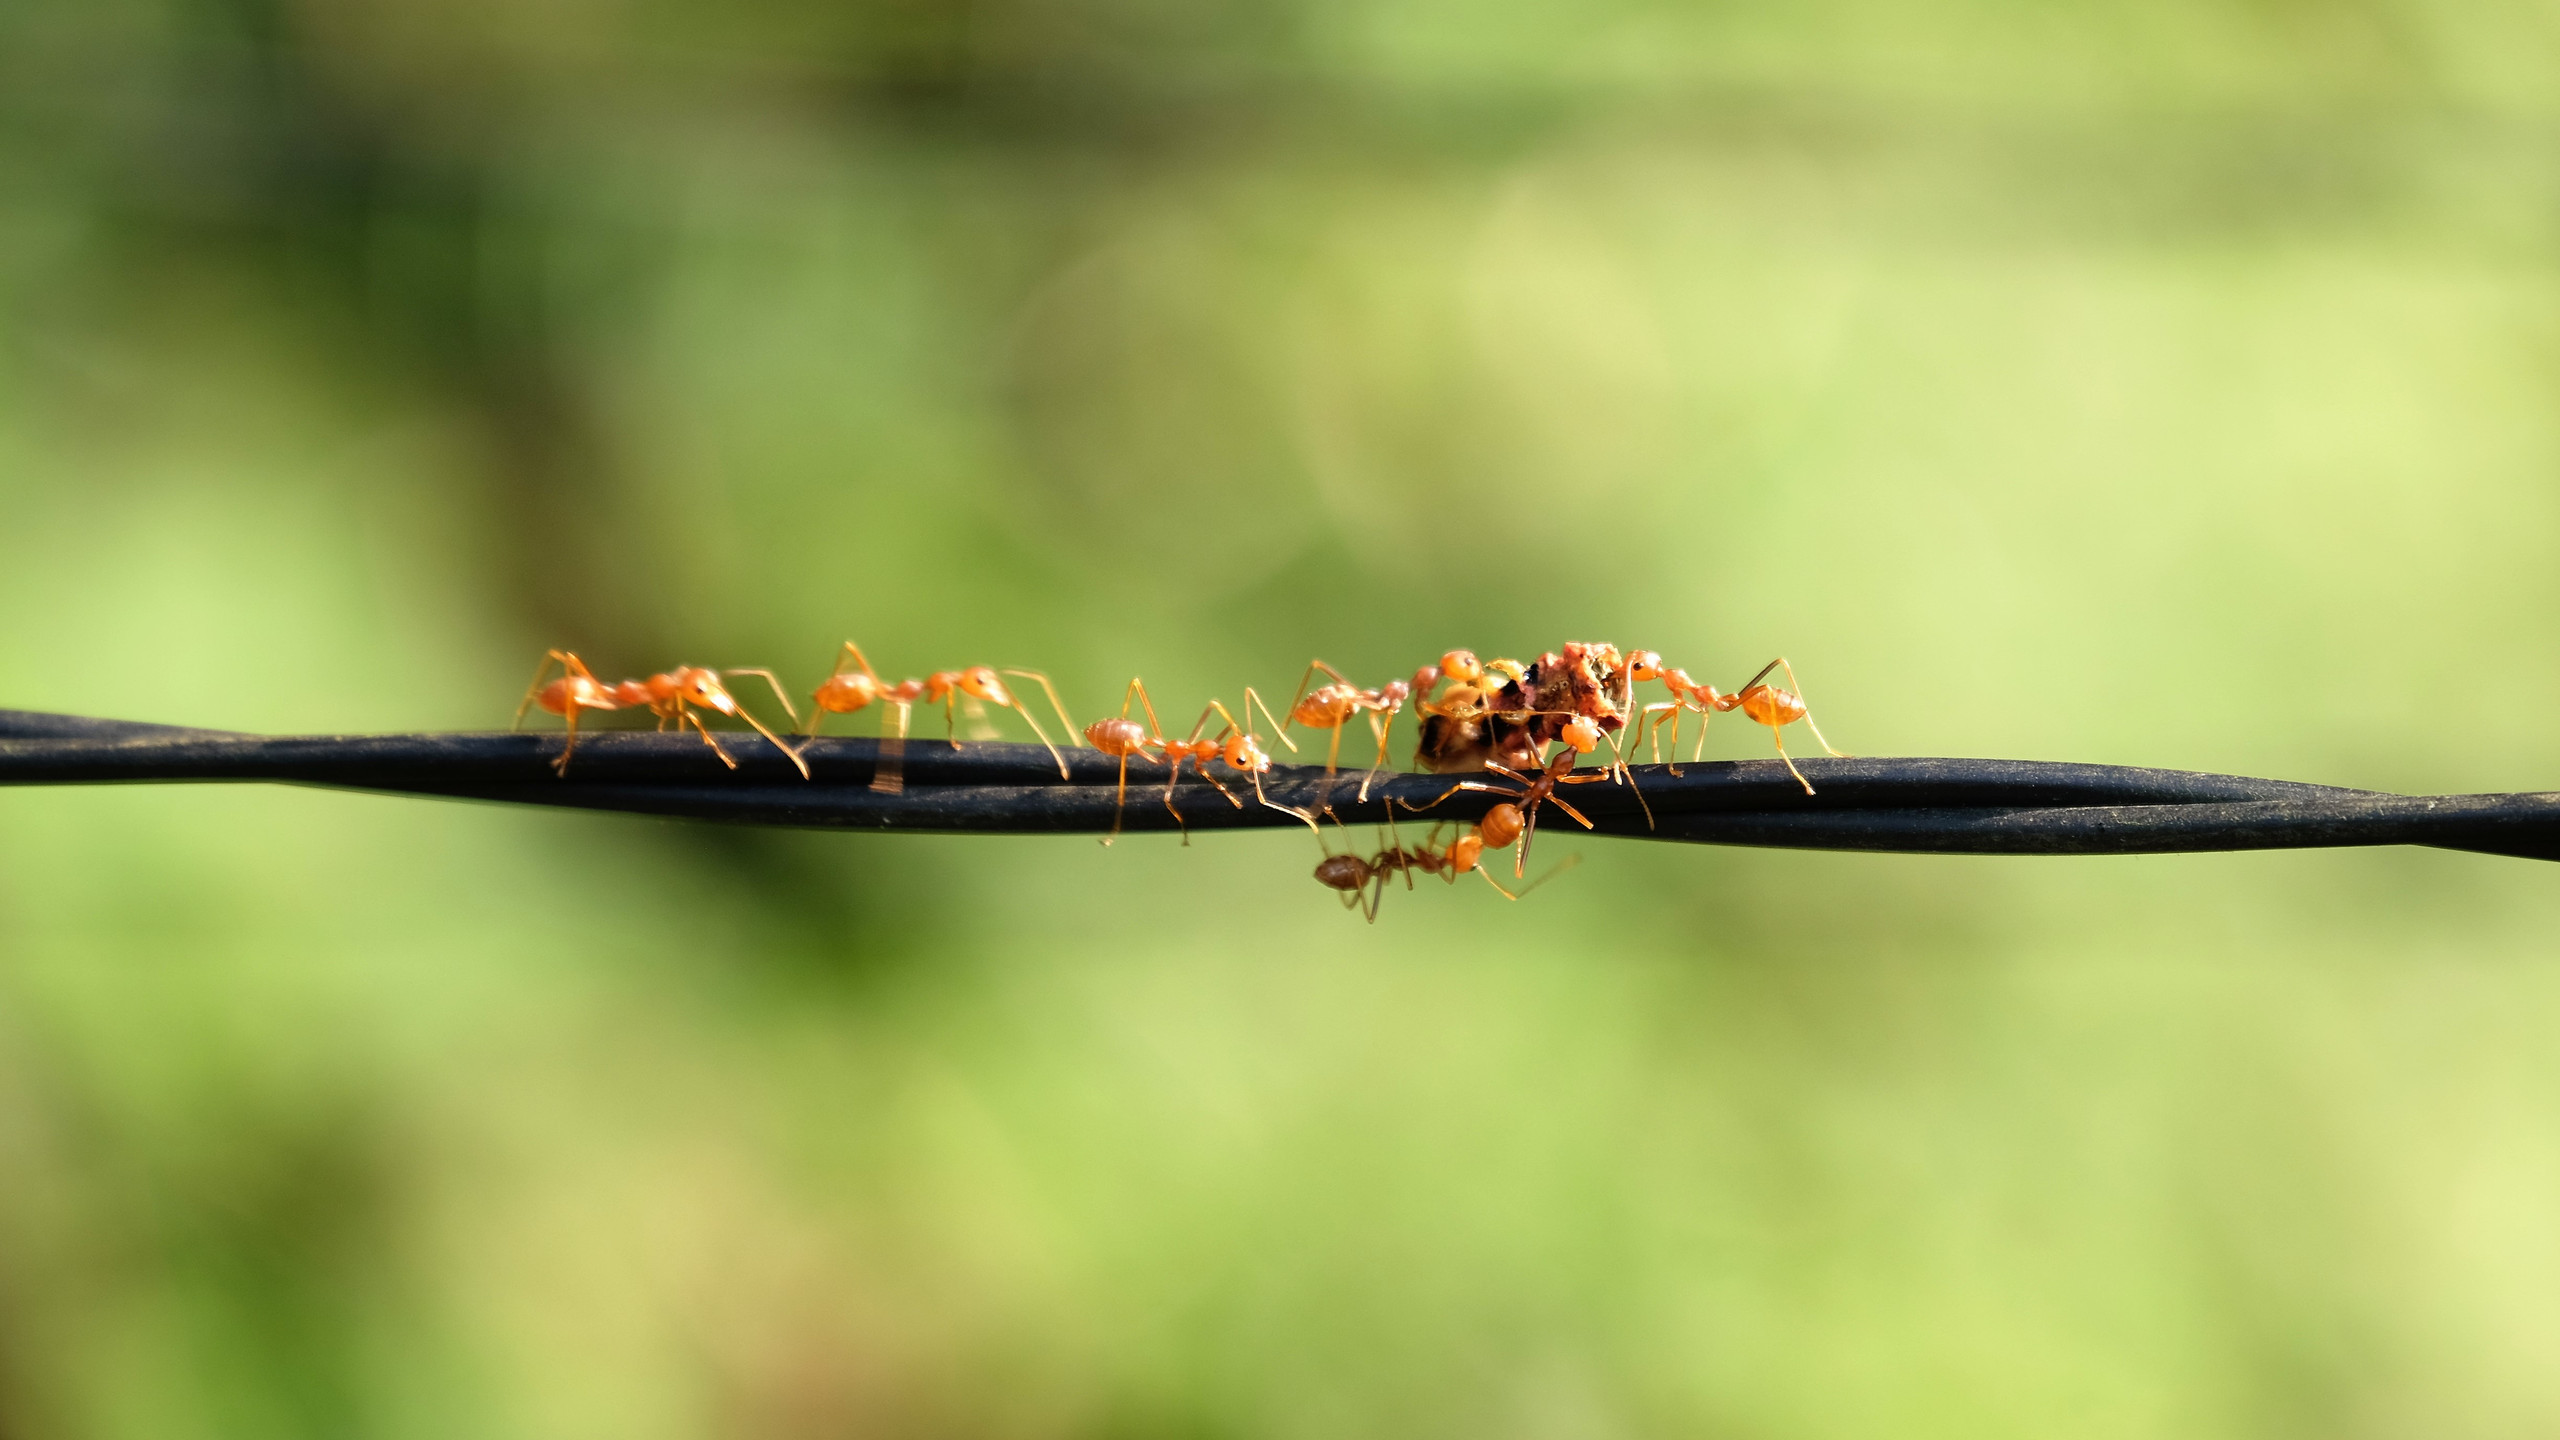 festin de fourmi